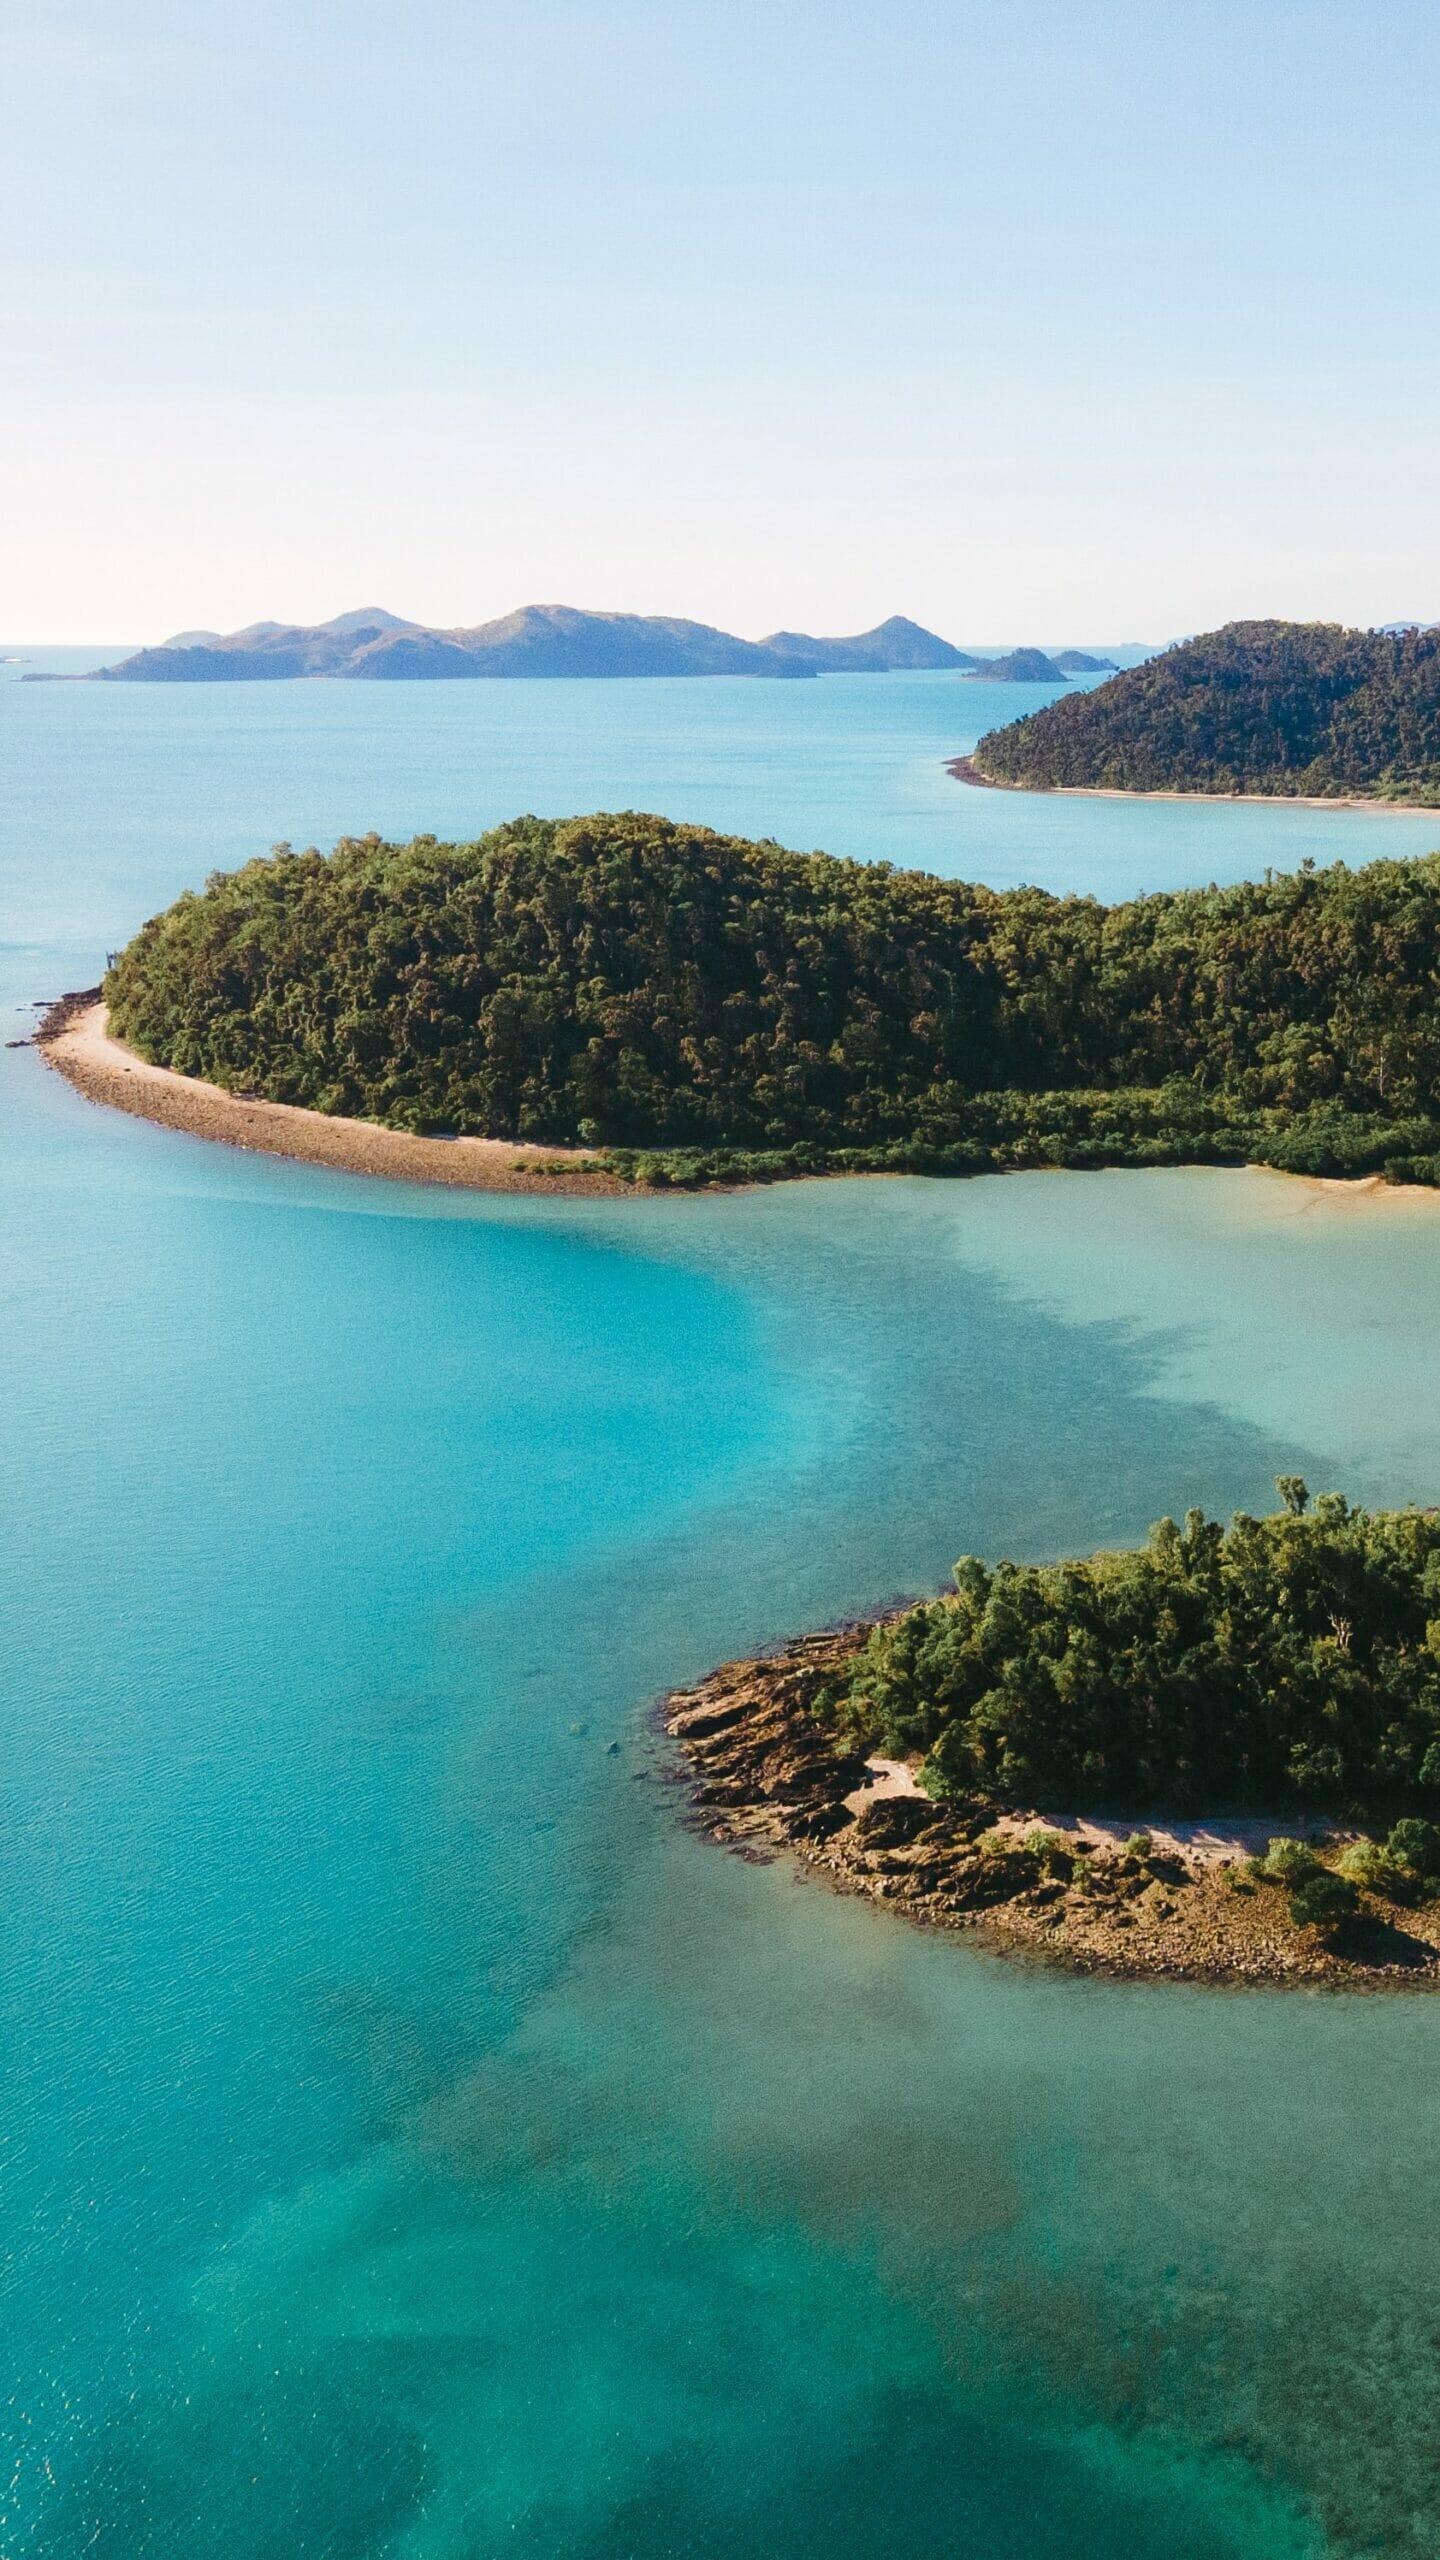 Aerial view of Palm Bay, Whitsundays QLD, Australia